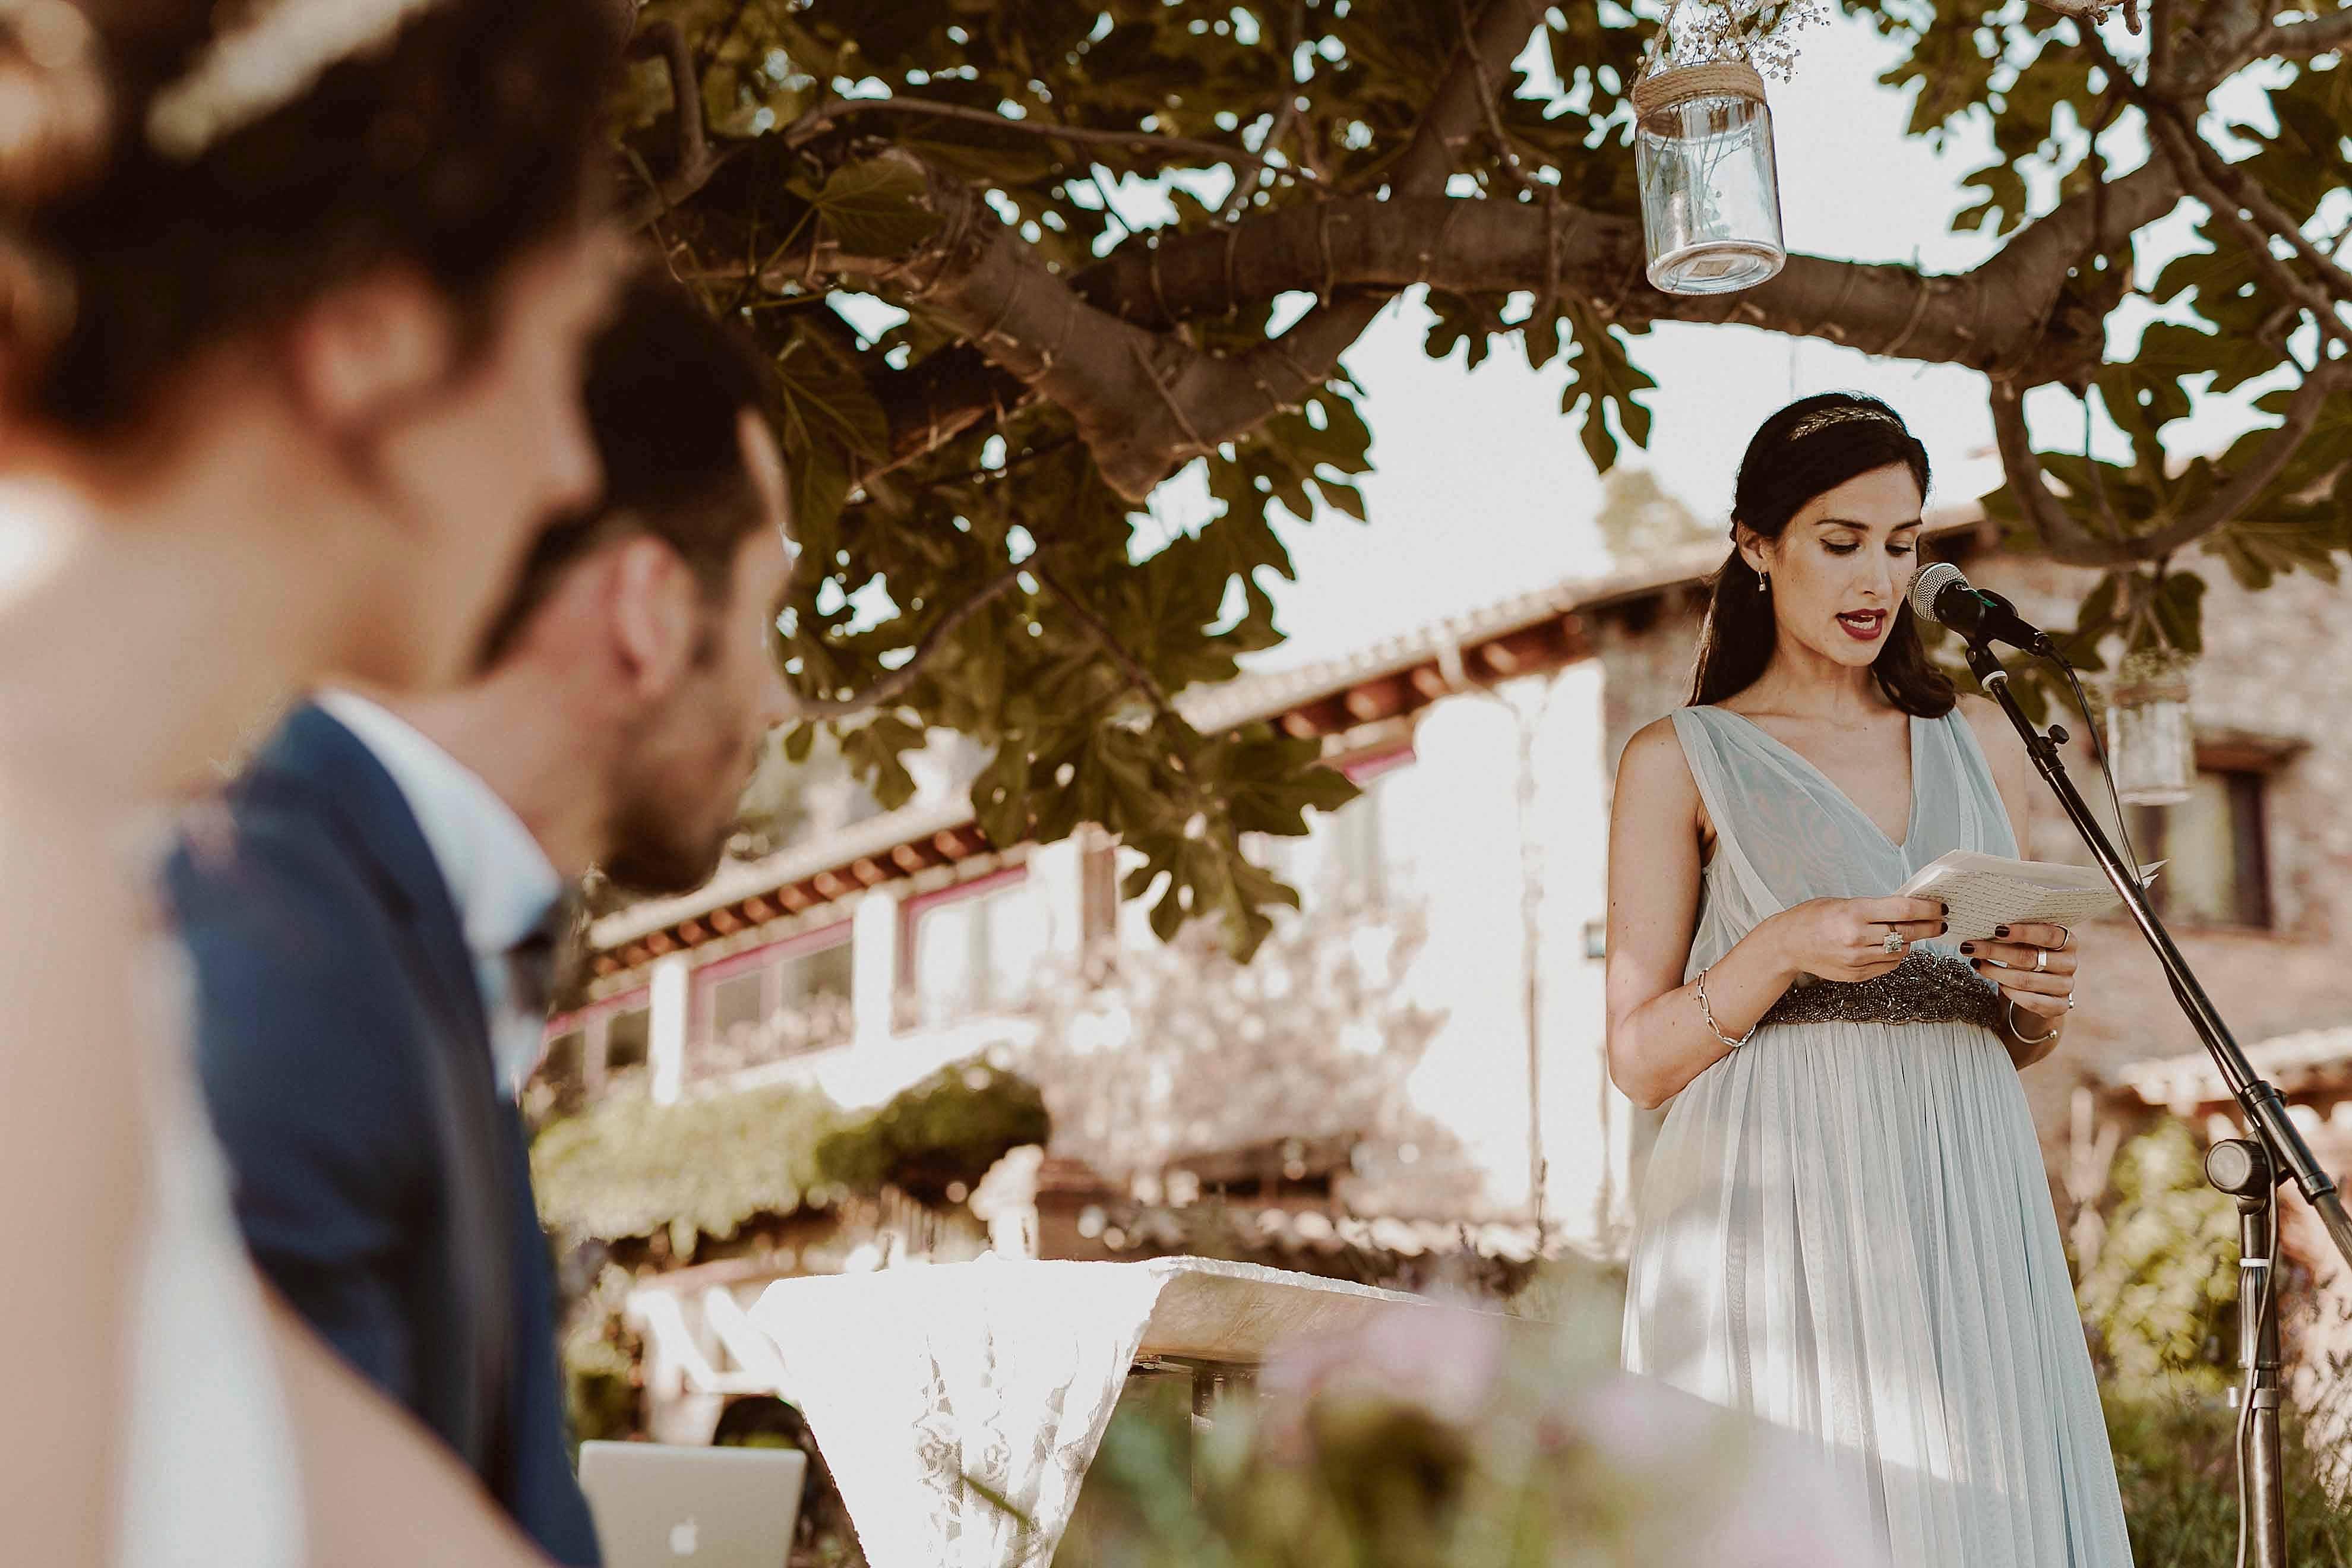 Boda rústica en la montaña. fotgrafo de bodas barcelona_053